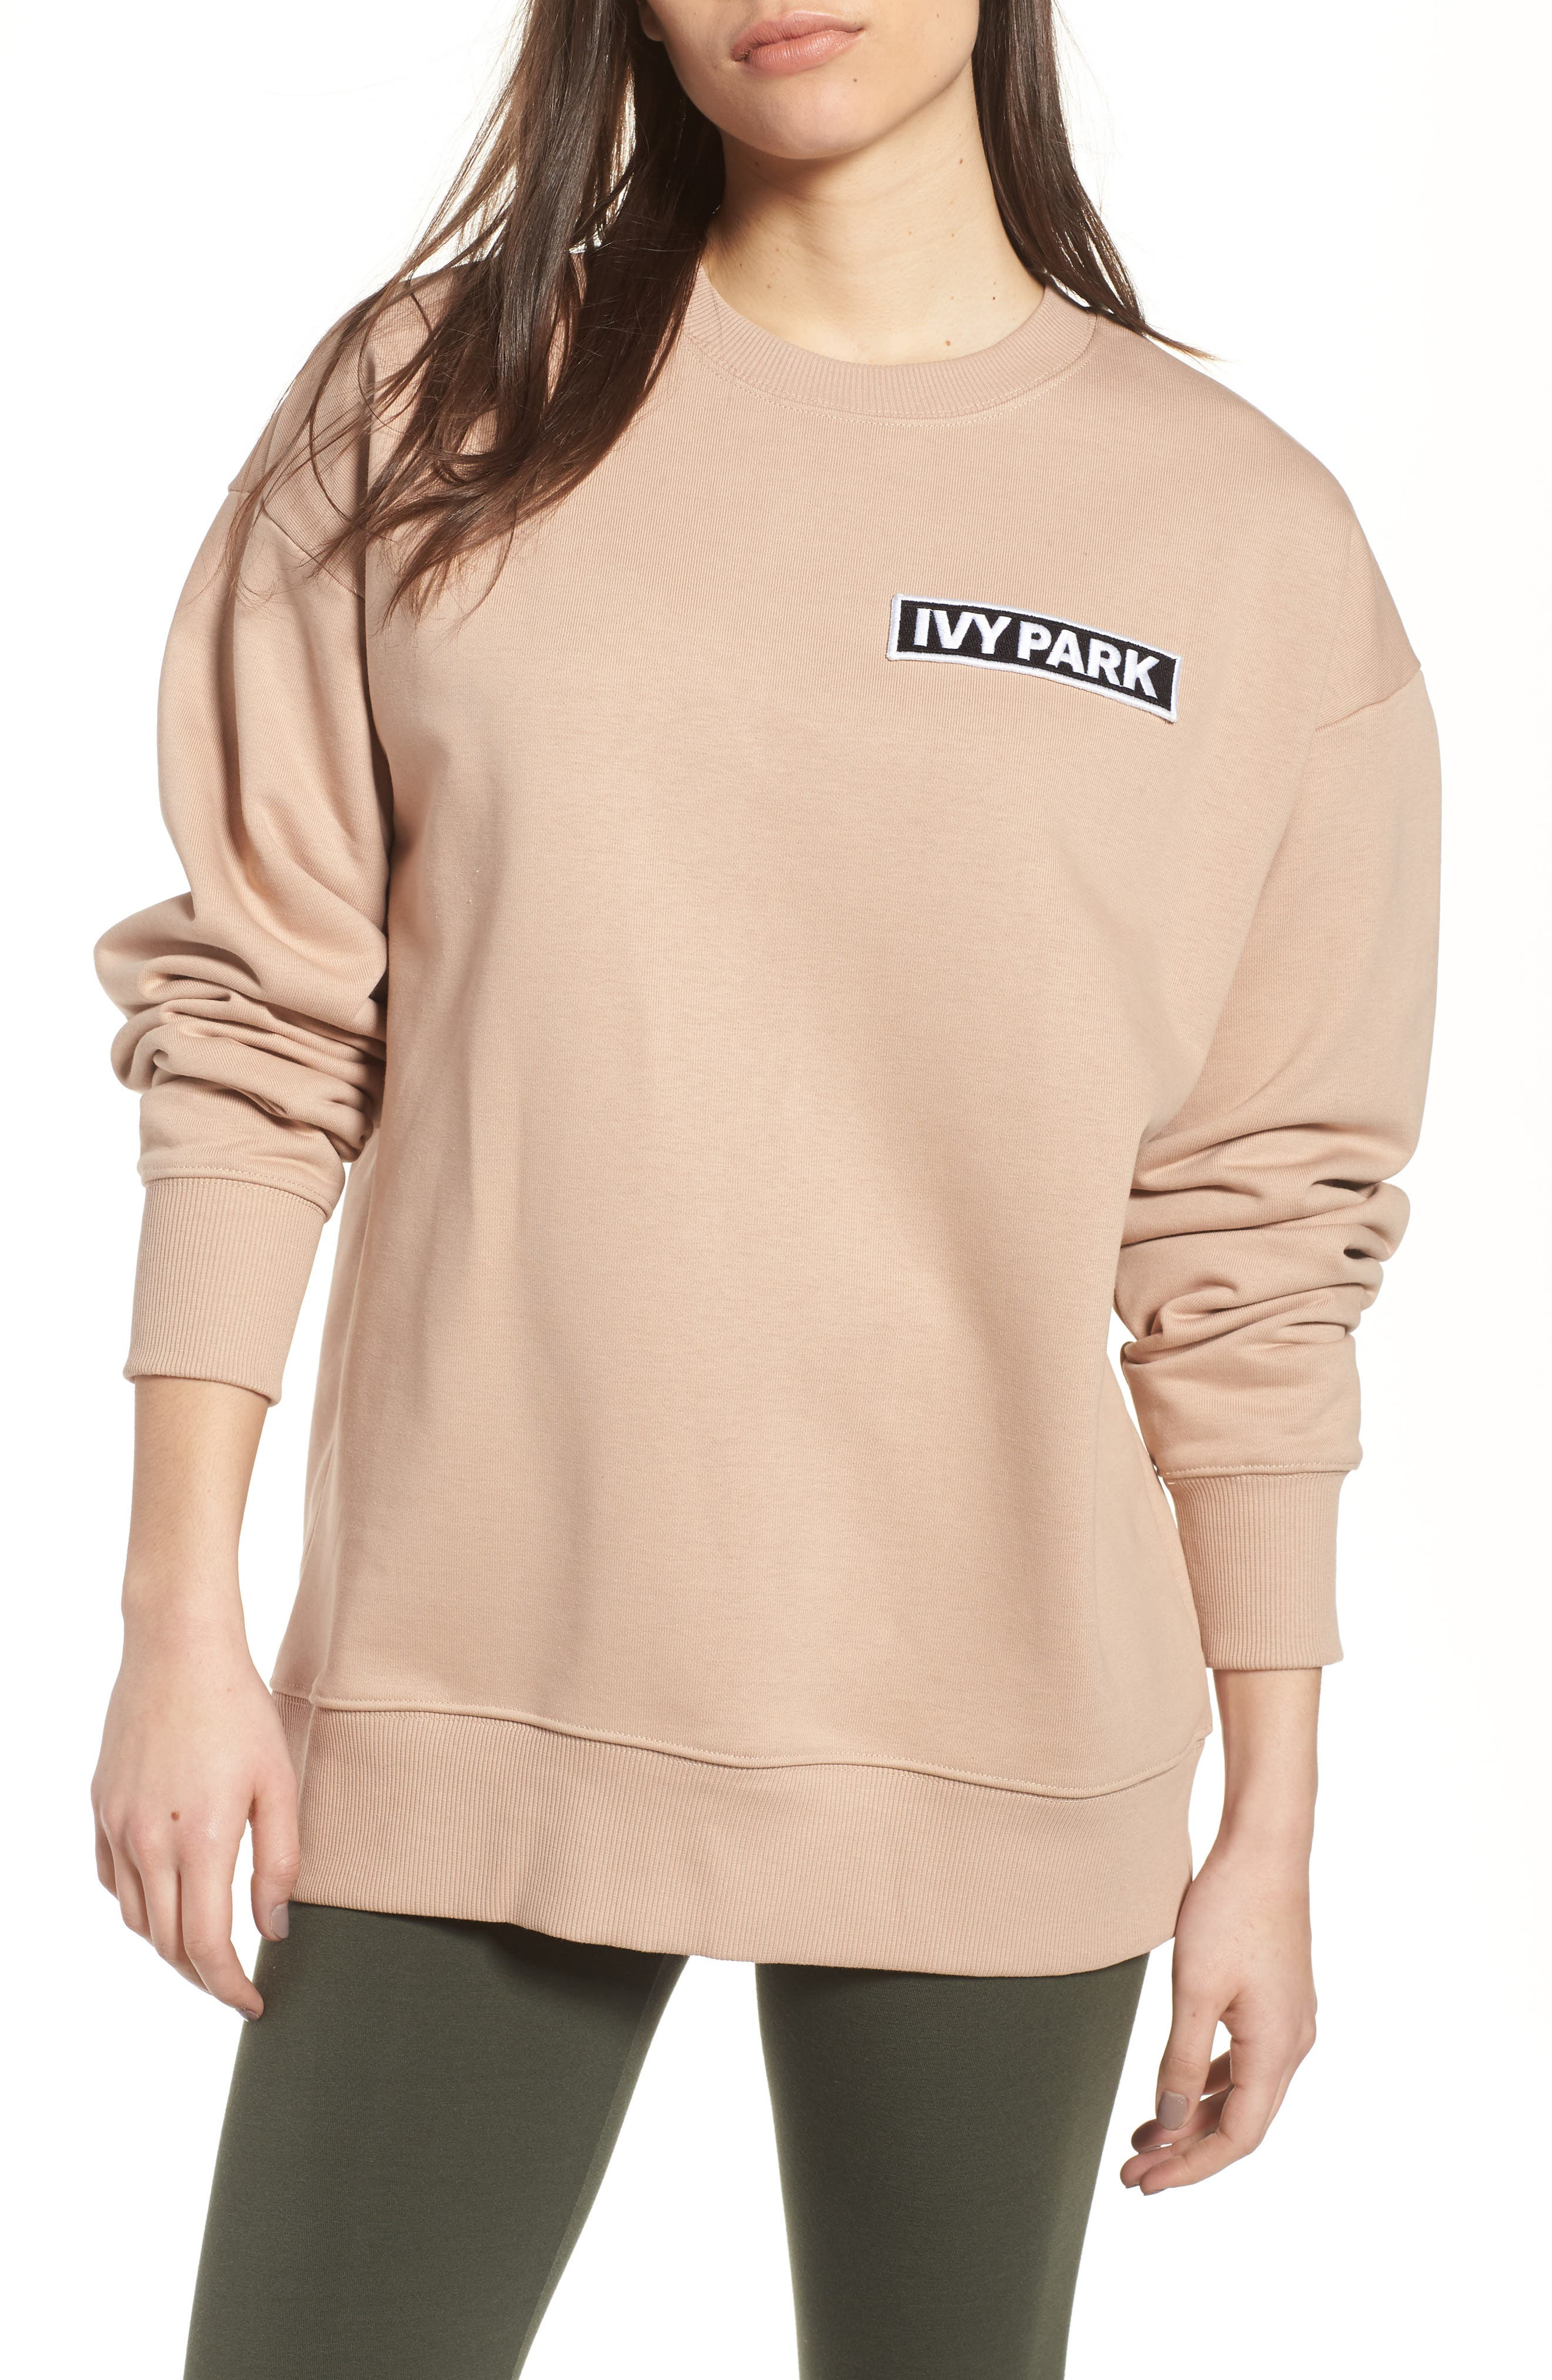 IVY PARK® Flag Badge Sweatshirt